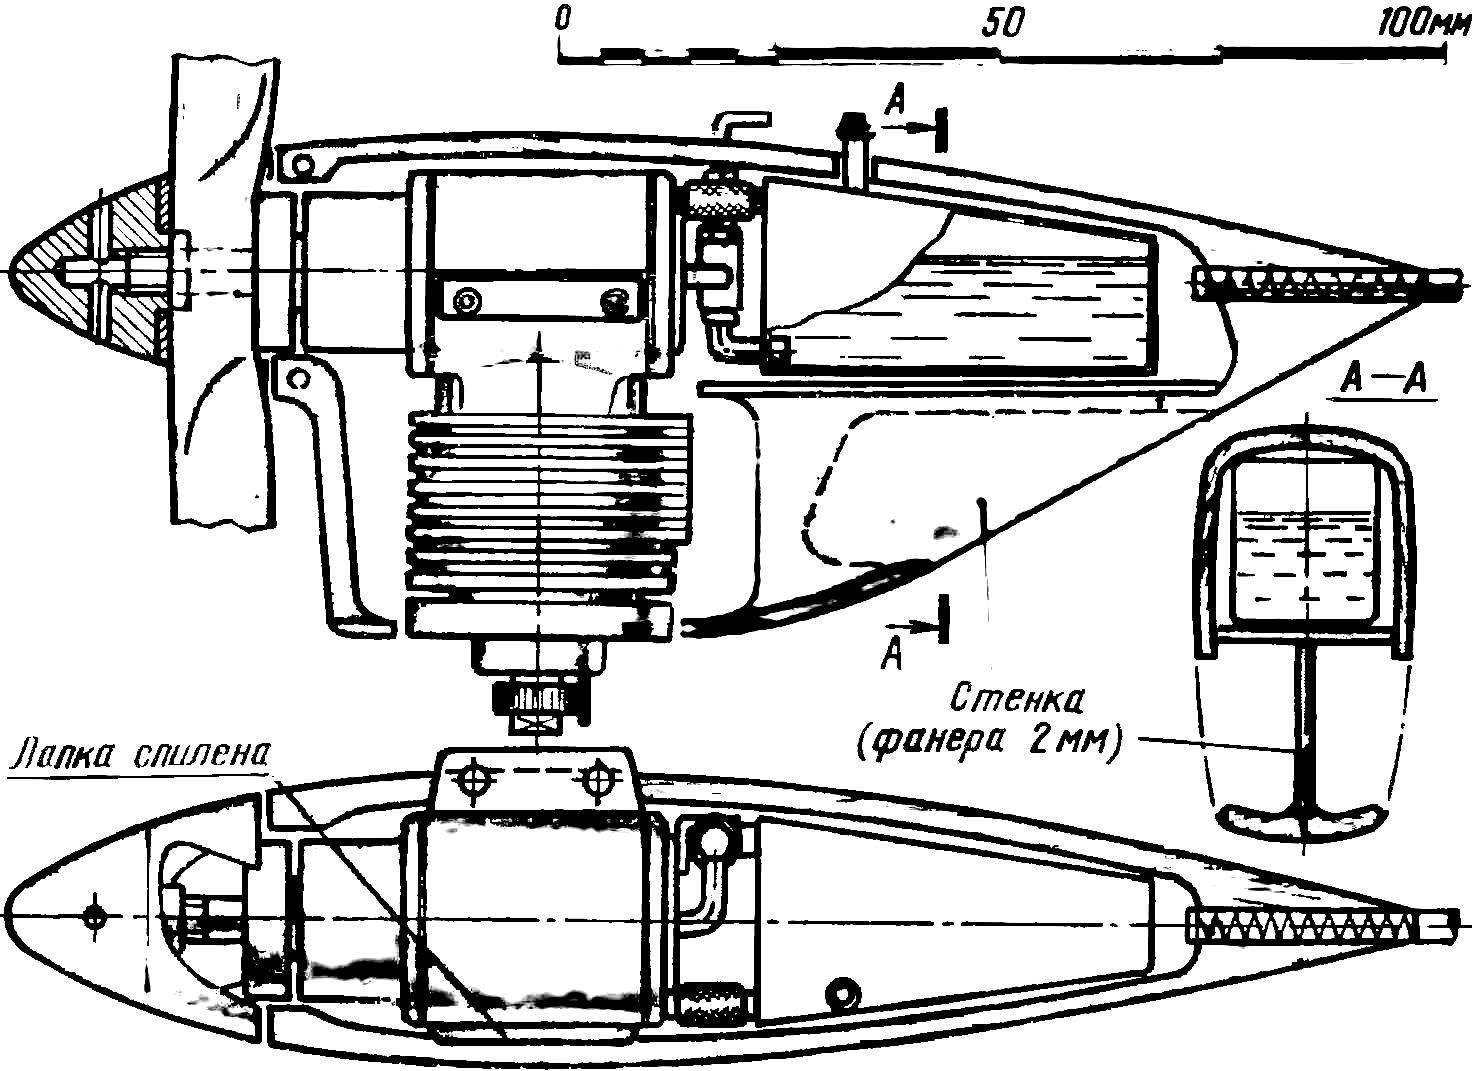 Рис. 2. Конструкция модели.